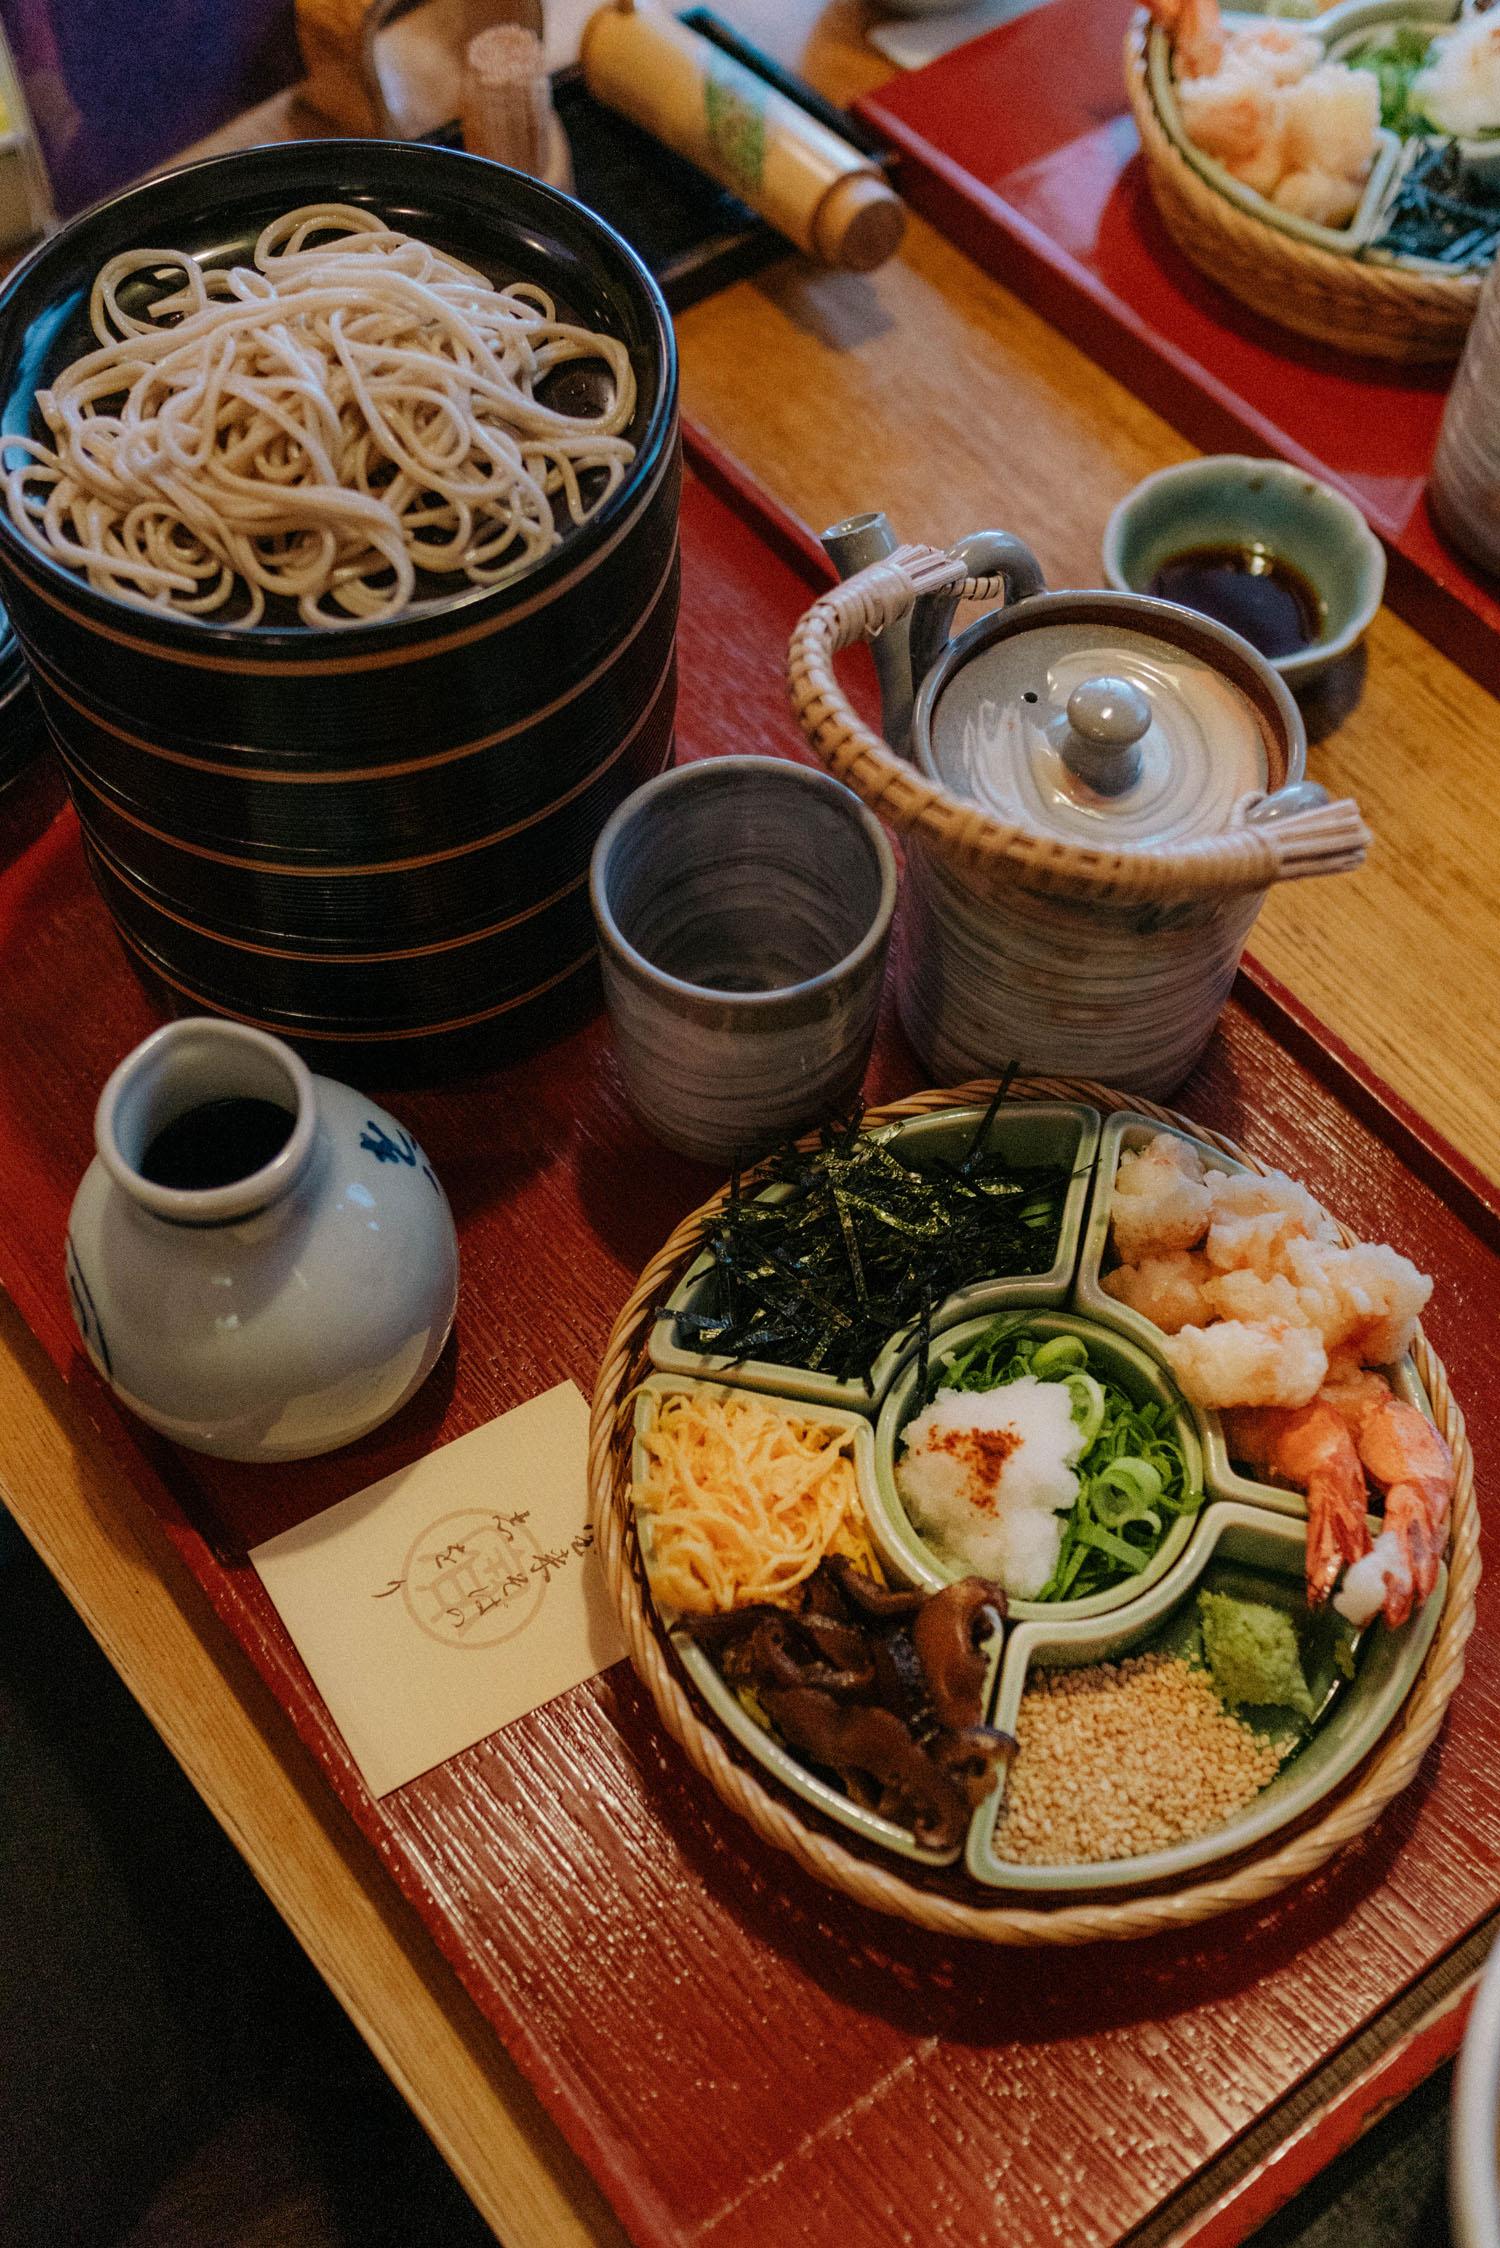 Cold Hourai soba that comes with 8 toppings of shiitake mushrooms, shredded omelet, shrimp tempura, nori, wasabi, grated daikon, sesame seeds, and green Japanese leeks